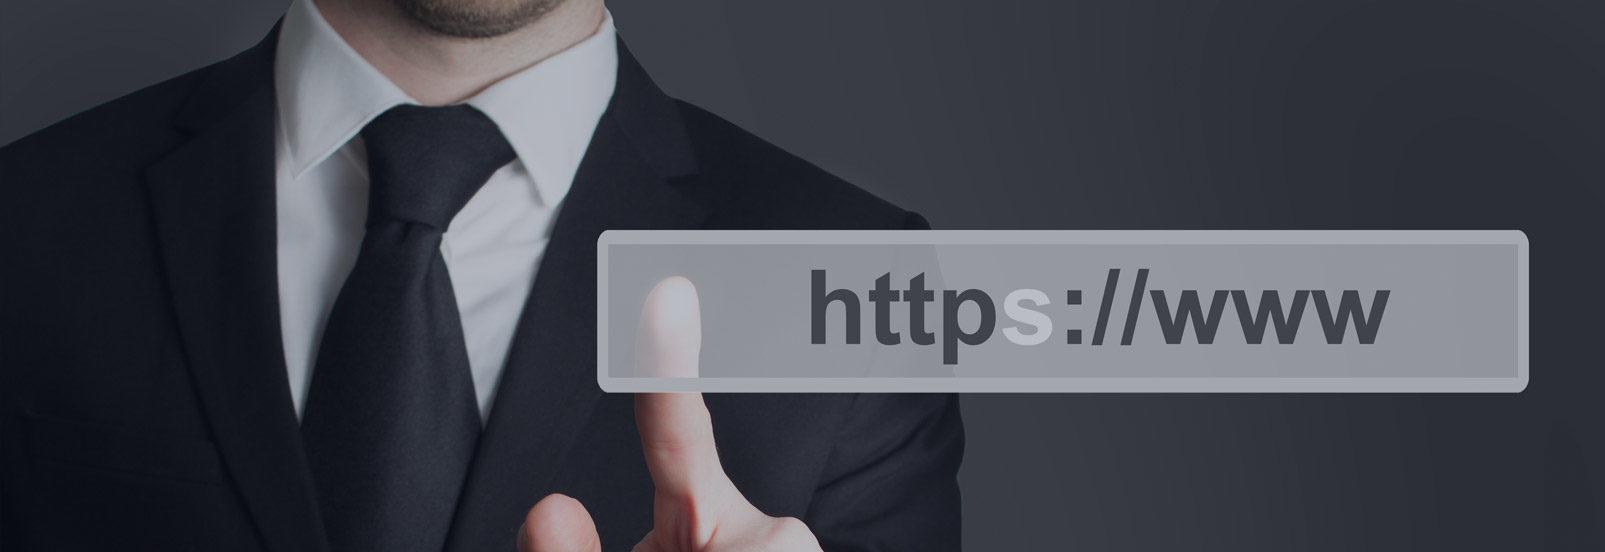 Increase your Google ranking through HTTPS